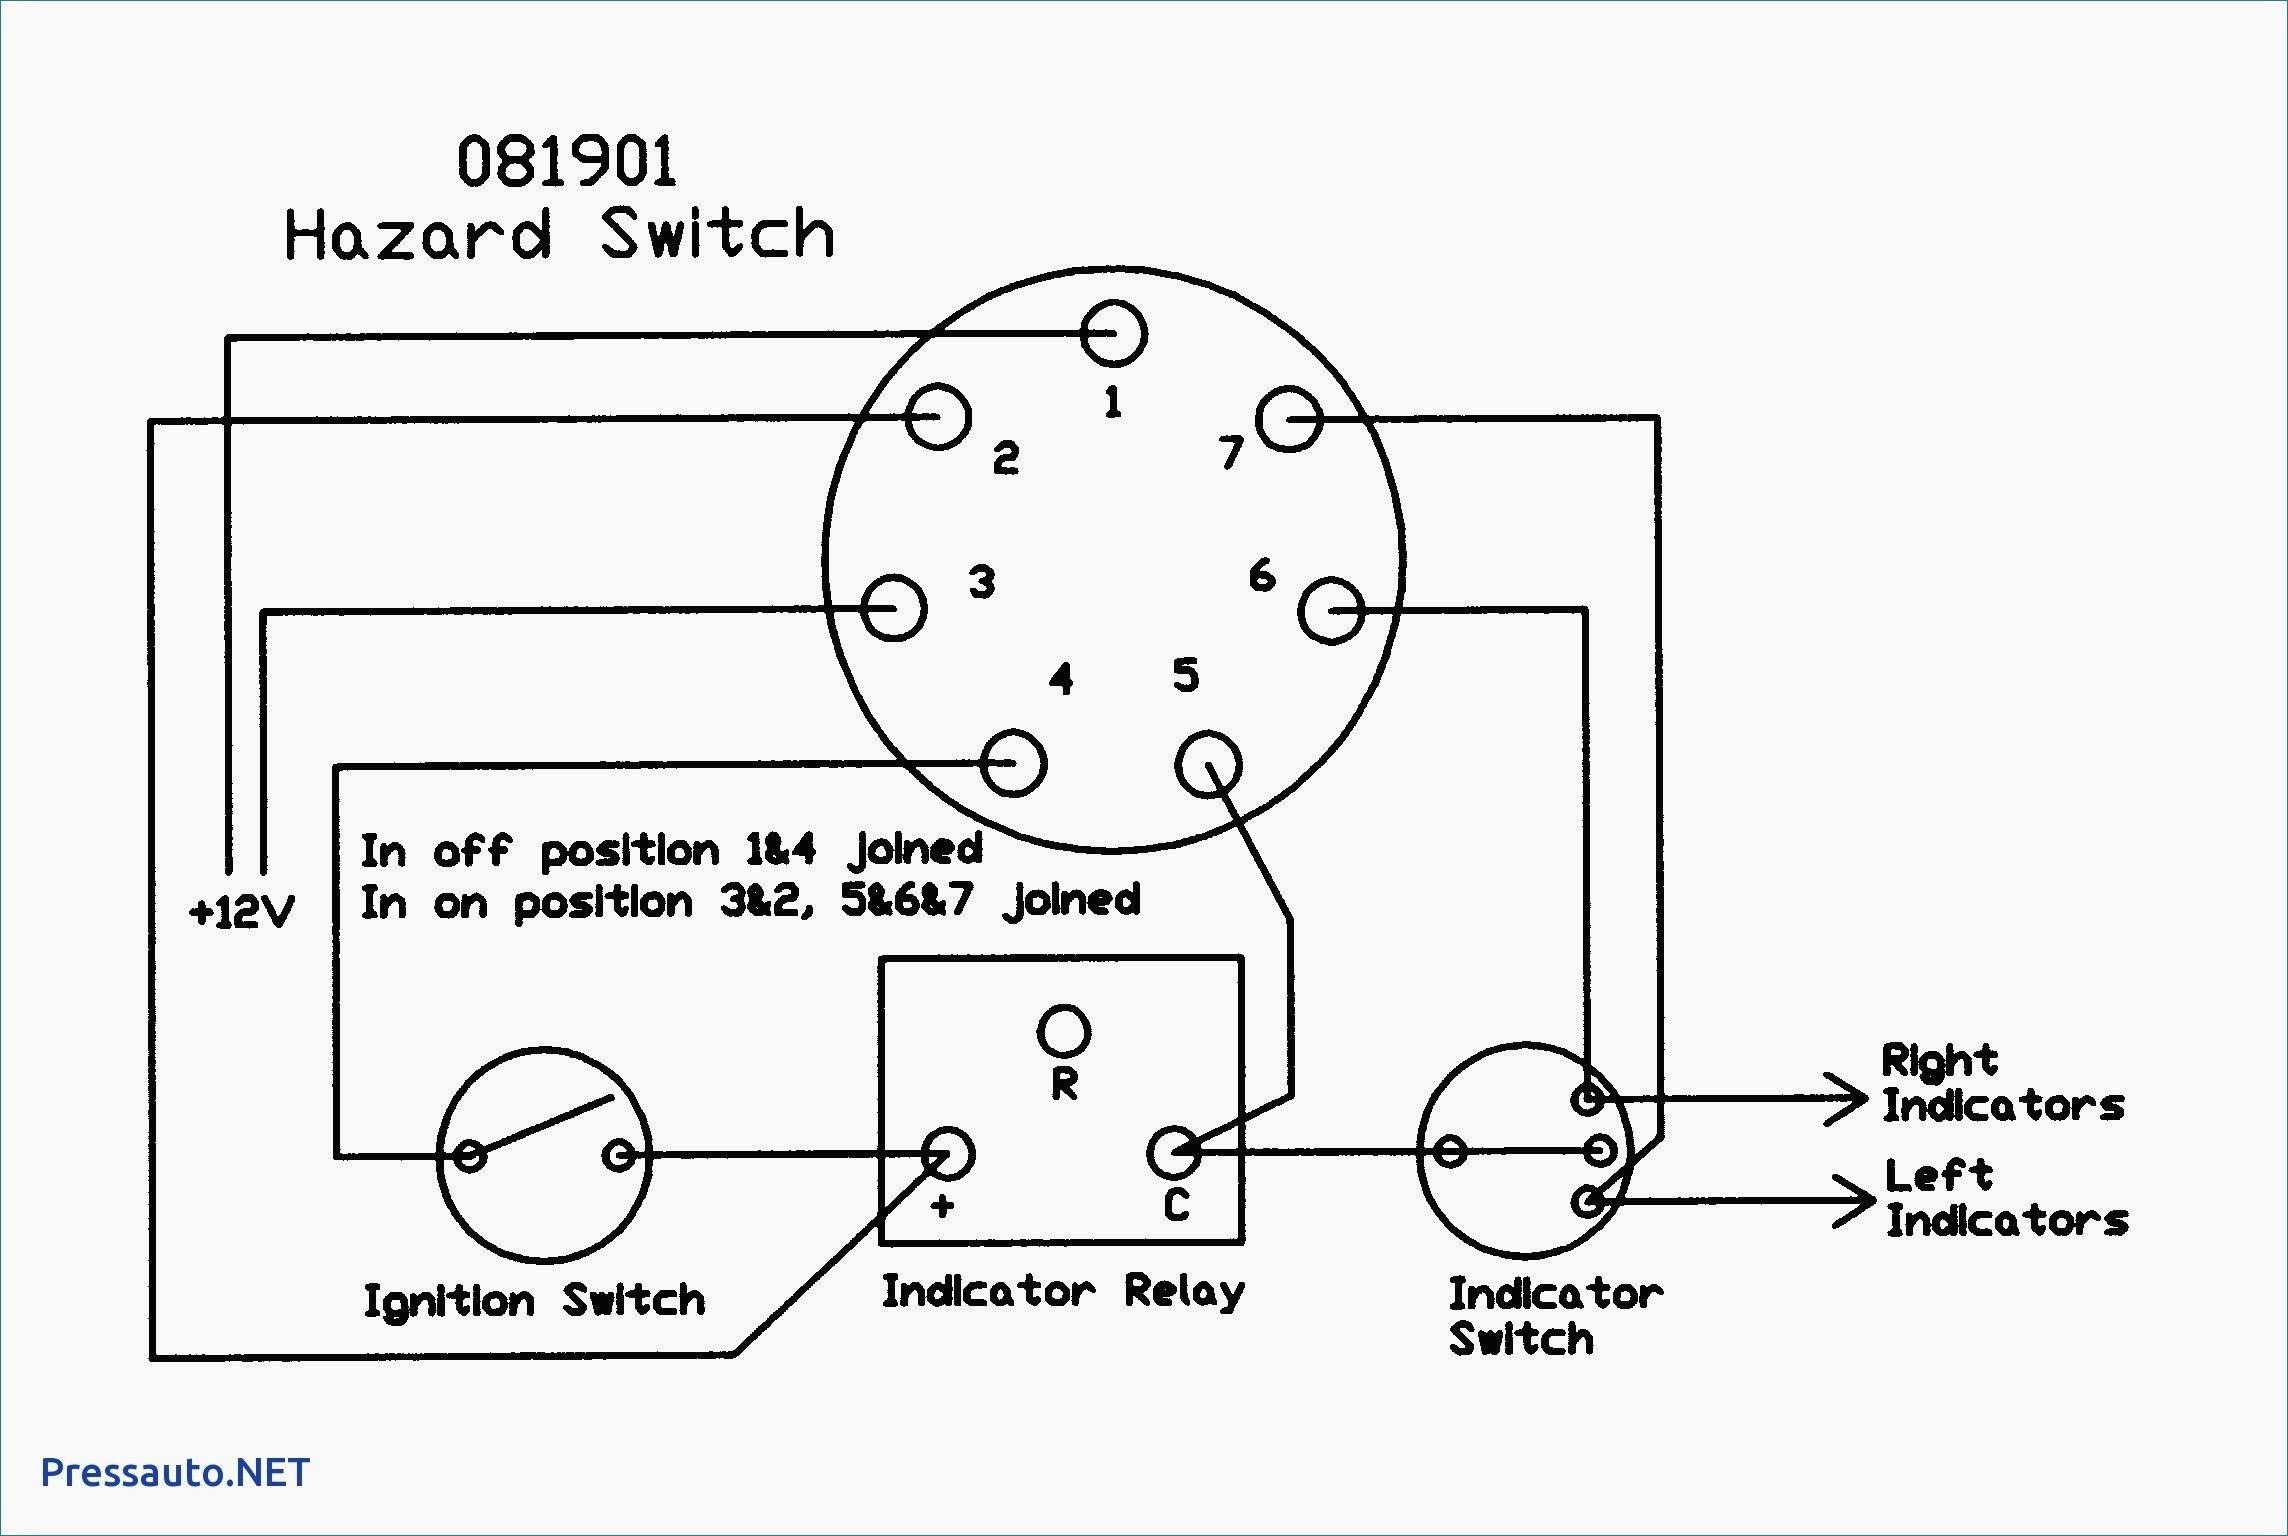 3 Wire Oil Pressure Switch Wiring Diagram